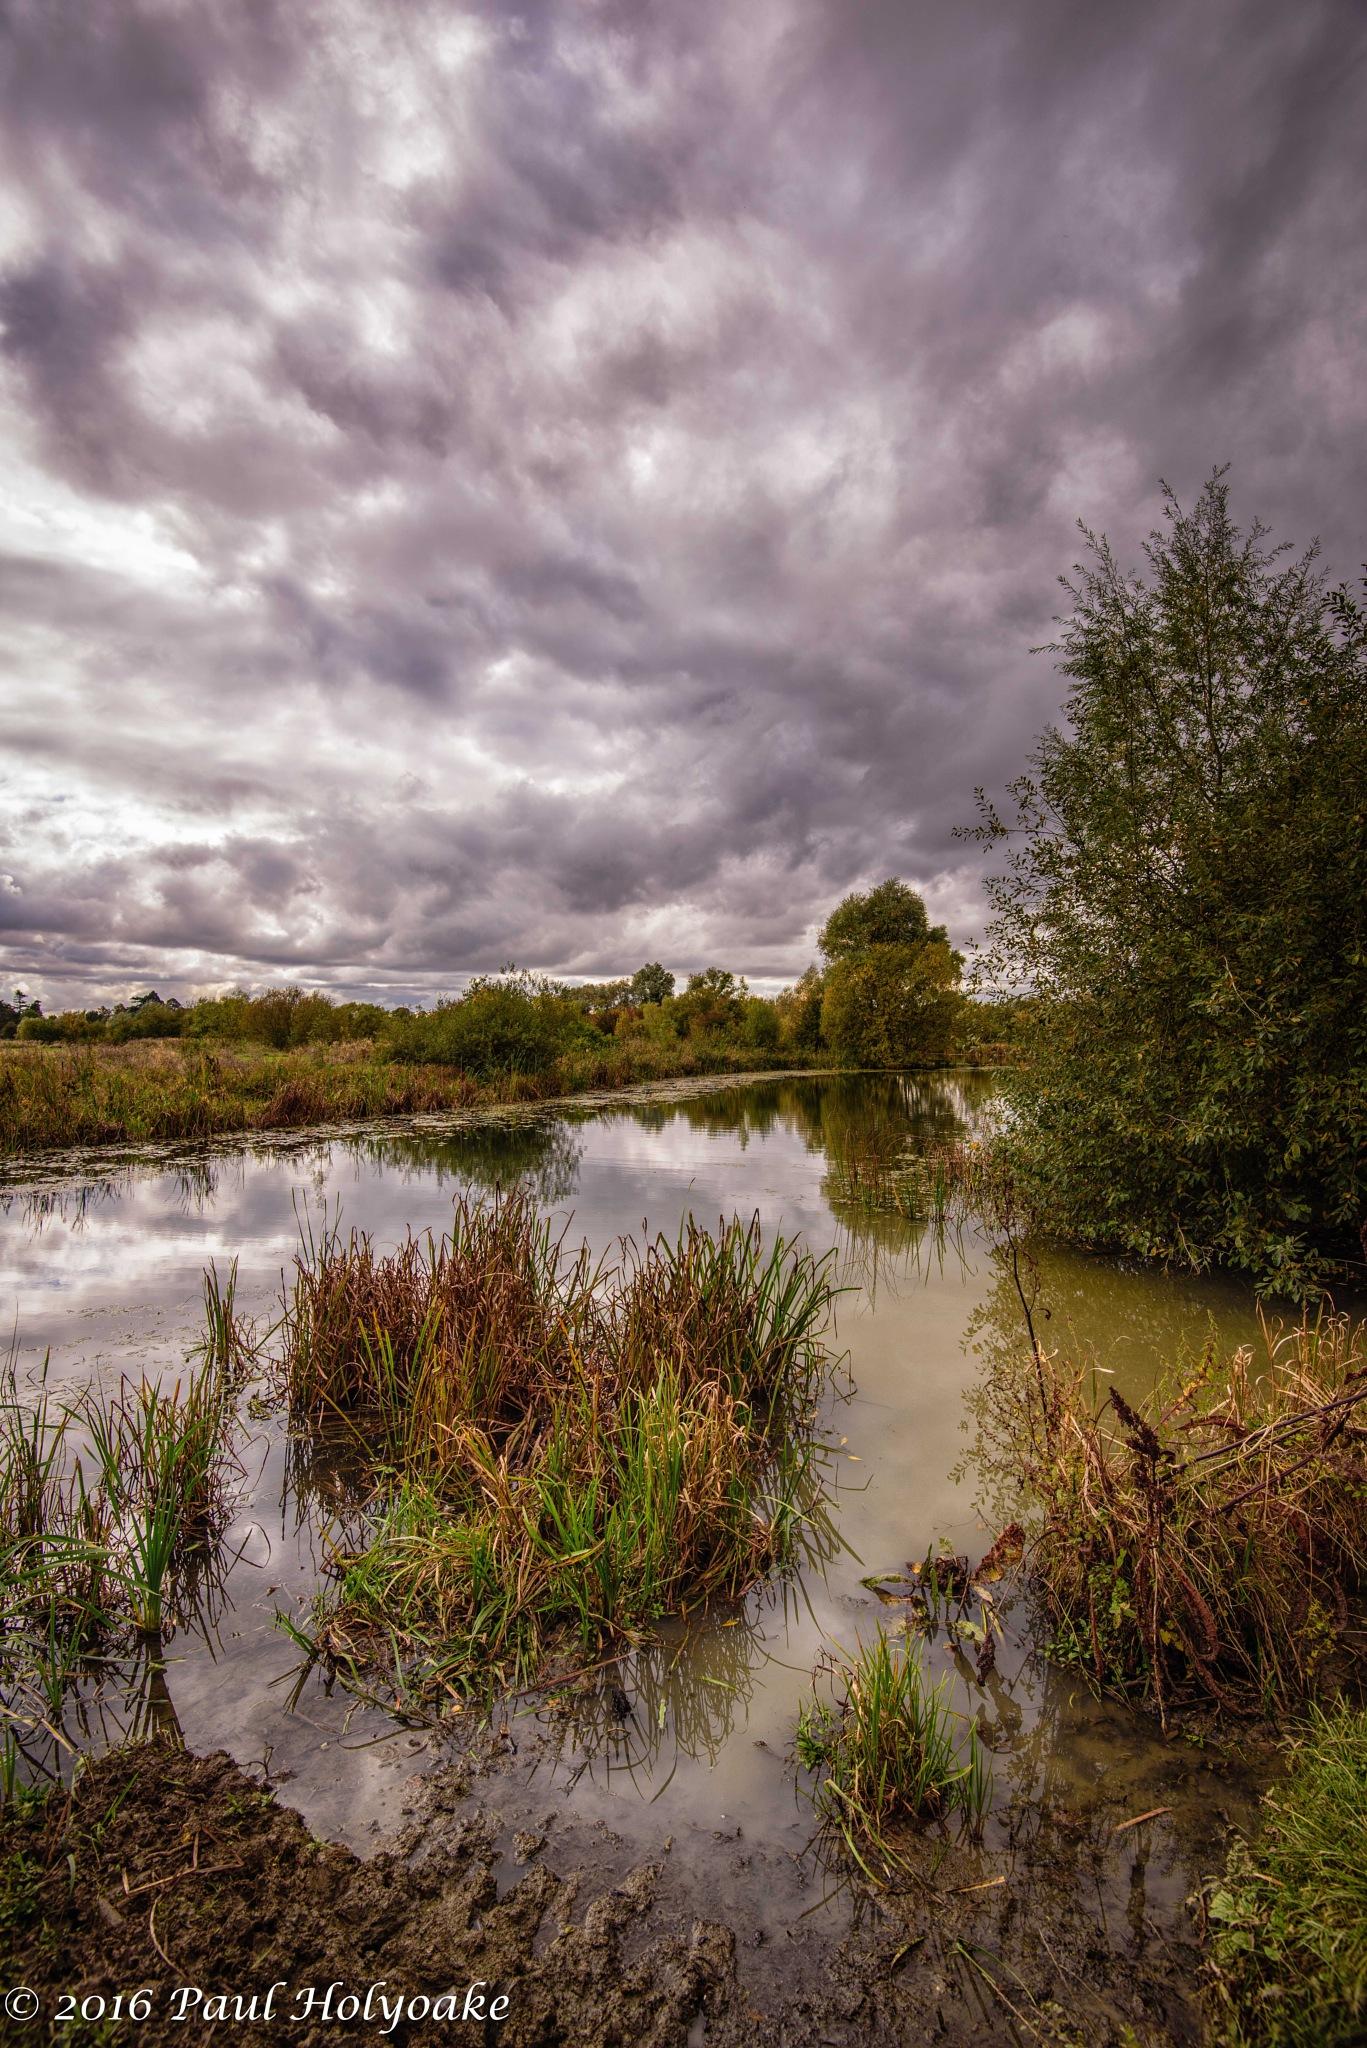 Muddy Reflection by Photon